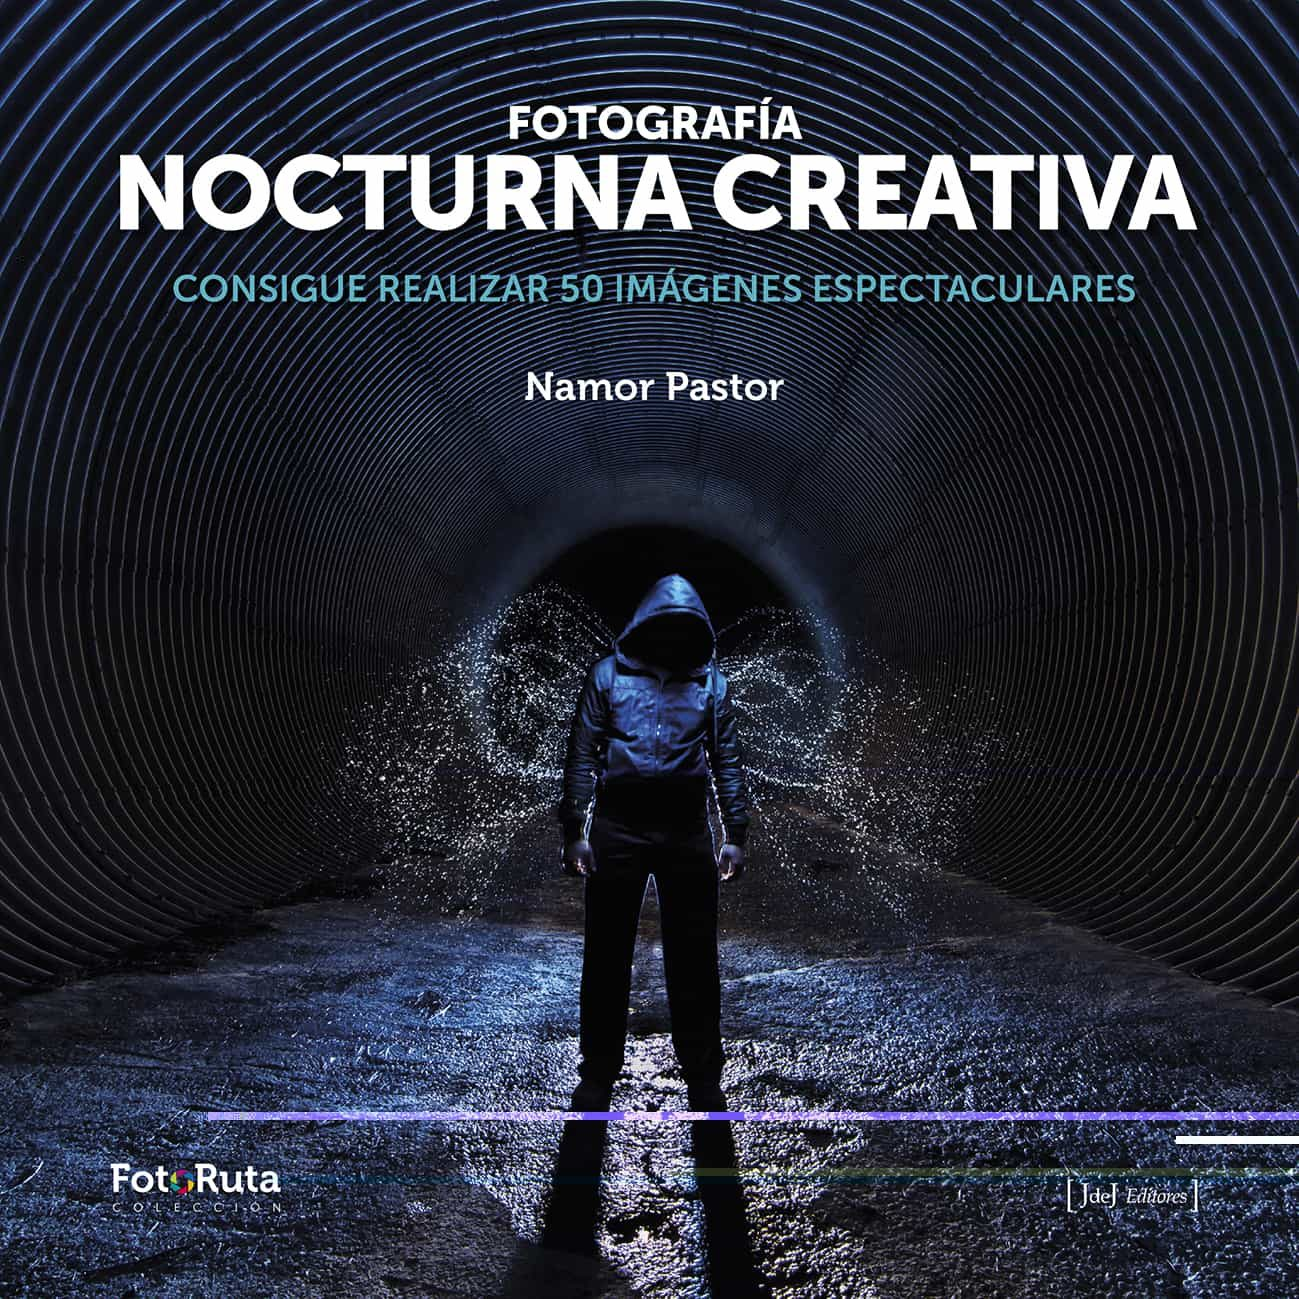 Fotografia Nocturna Creativa: Consigue Realizar 50 Imagenes Espectacul - Pastor Namor